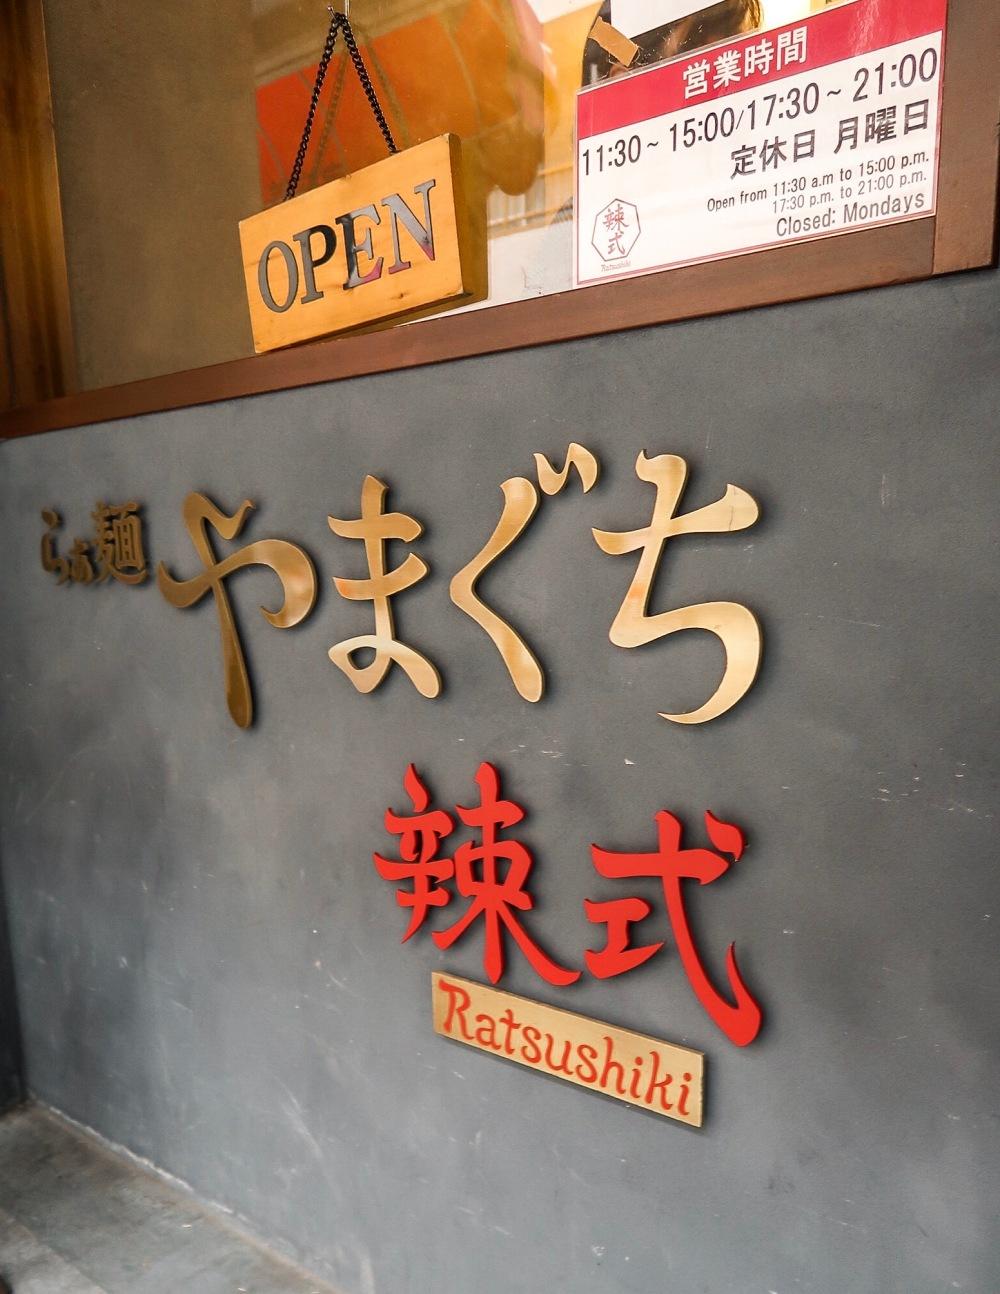 yamaguchi ratsushiki_3